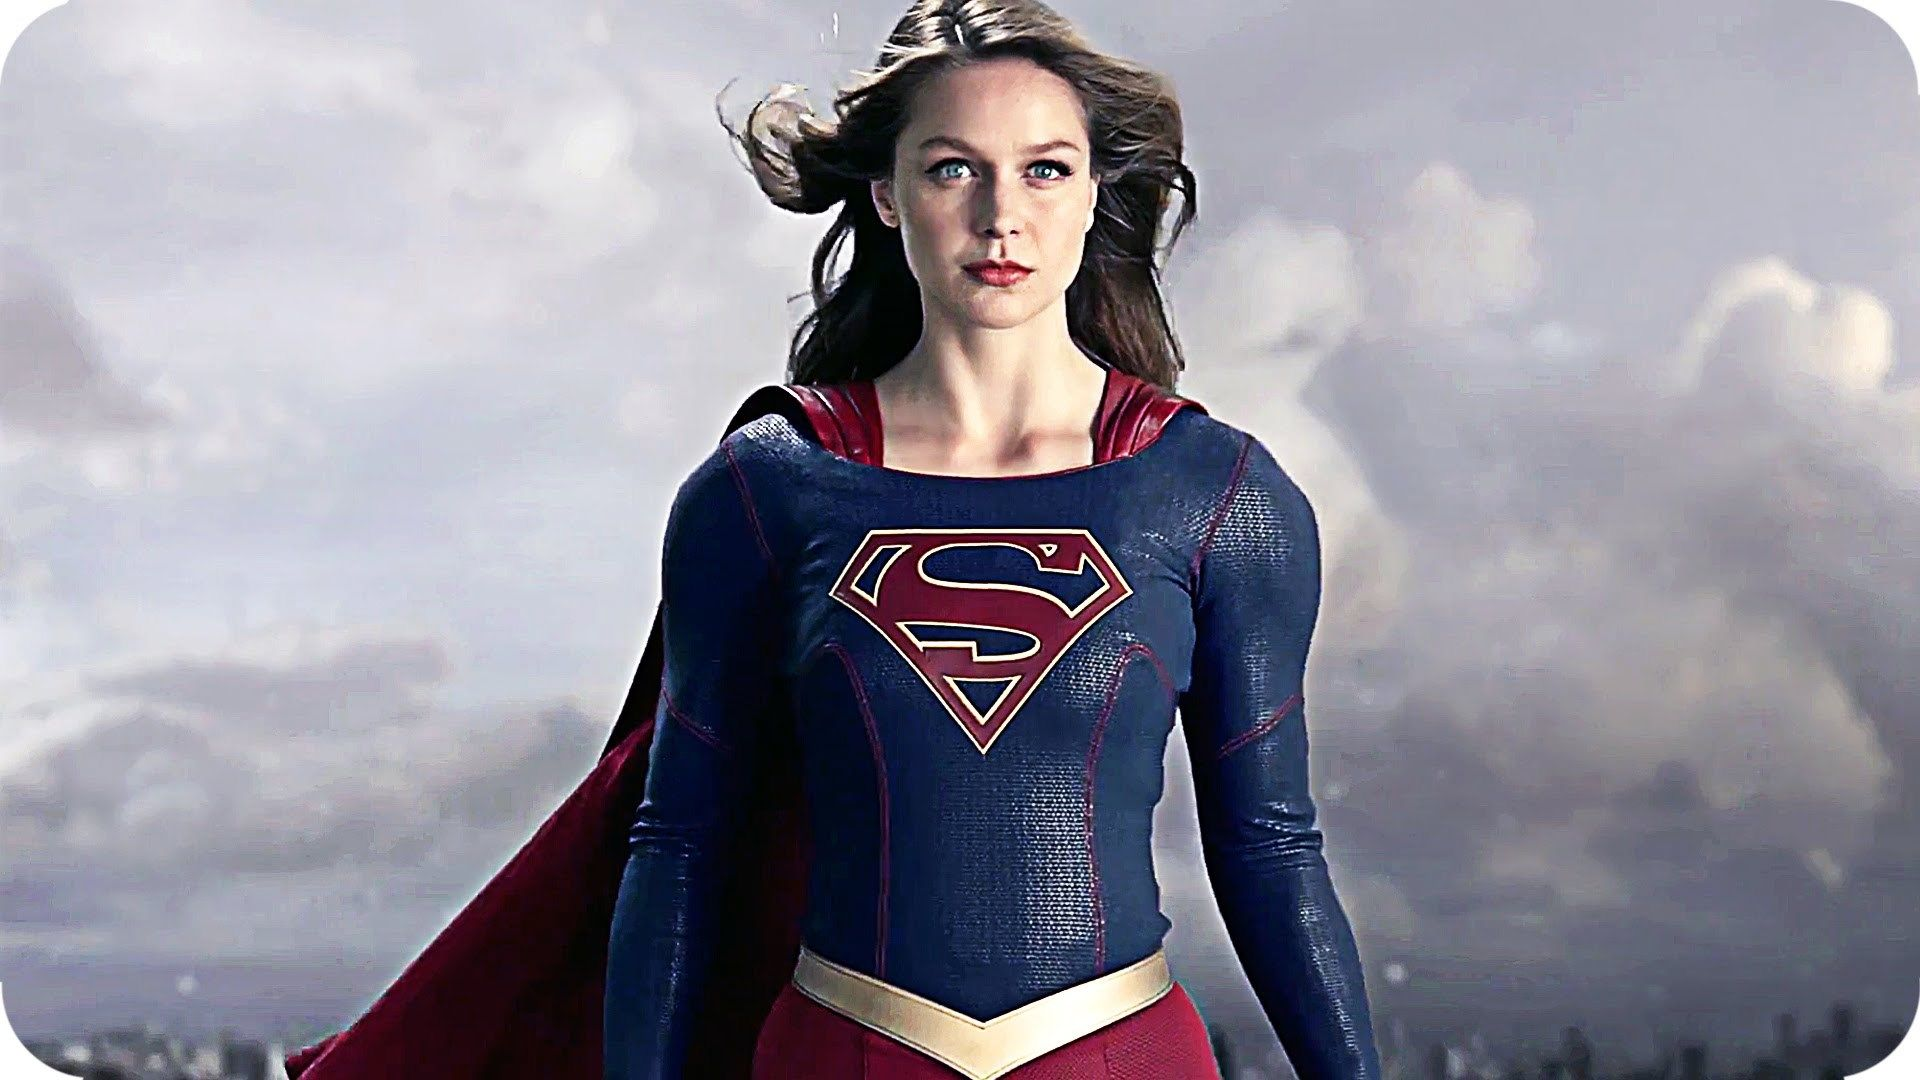 Melissa Benoist Supergirl Wallpaper Girls HD Wallpapers 1920×1080 Supergirl Pictures Wallpapers (45 Wallpapers) | Adorable Wallpapers